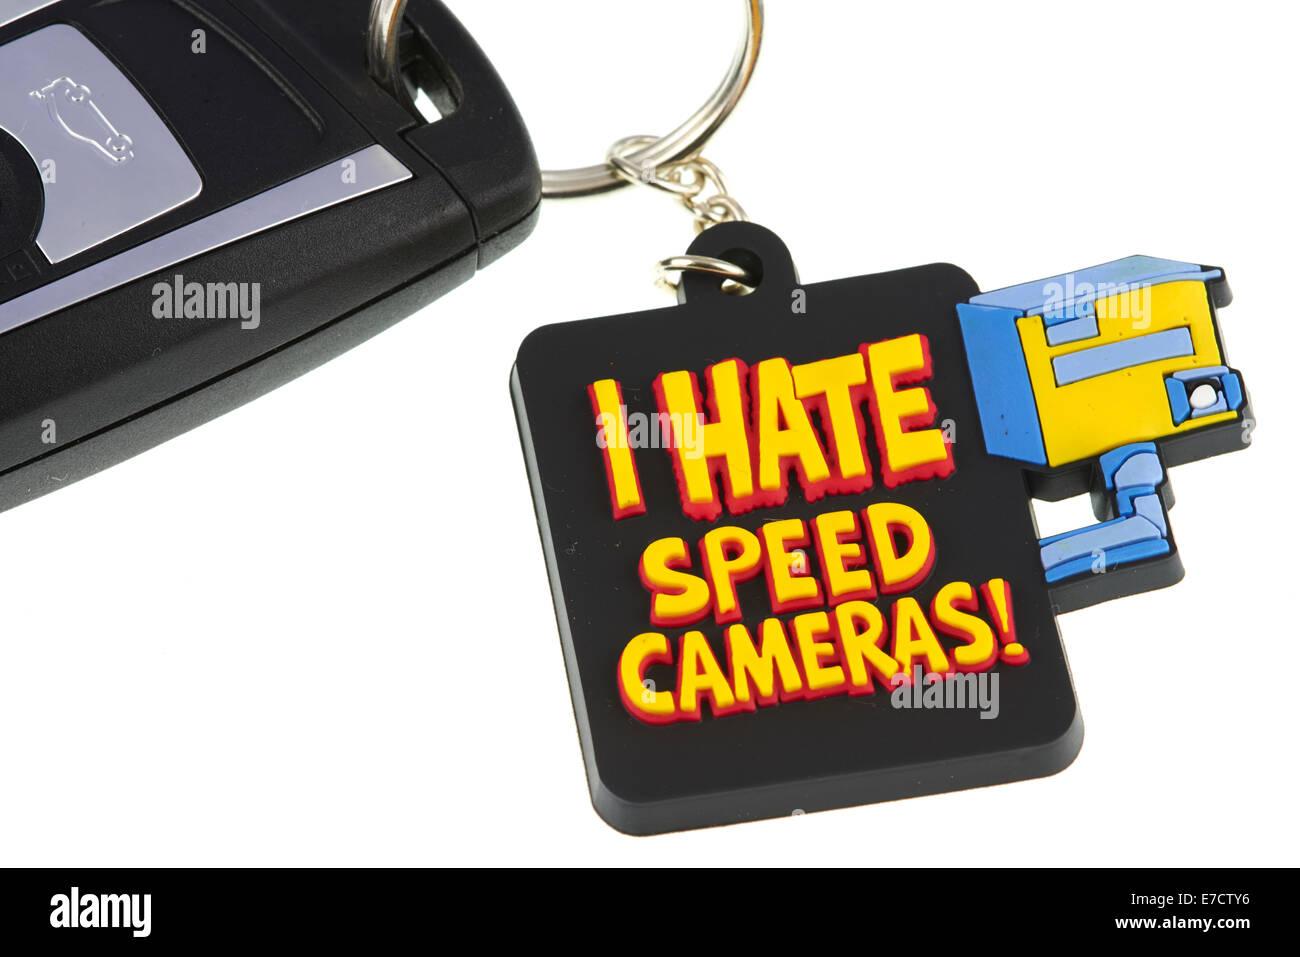 I Hate Speed Cameras Key Fob - Stock Image